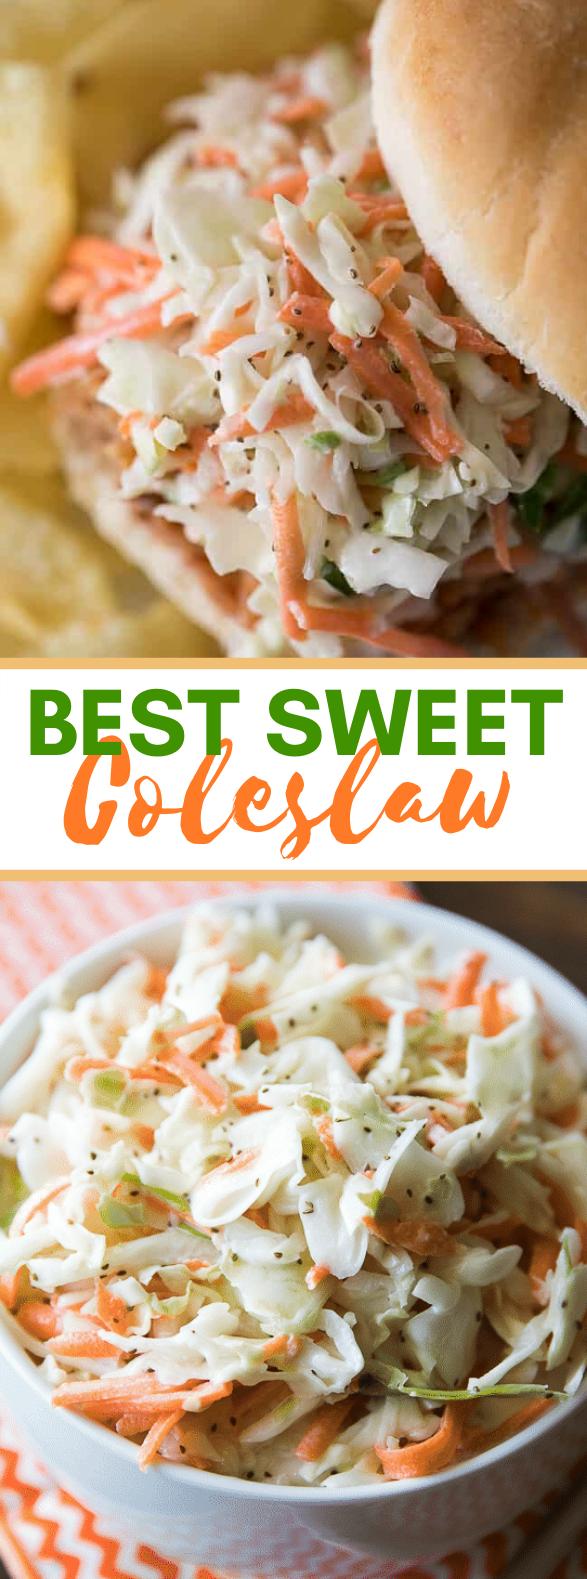 BEST SWEET COLESLAW #vegetarian #salad